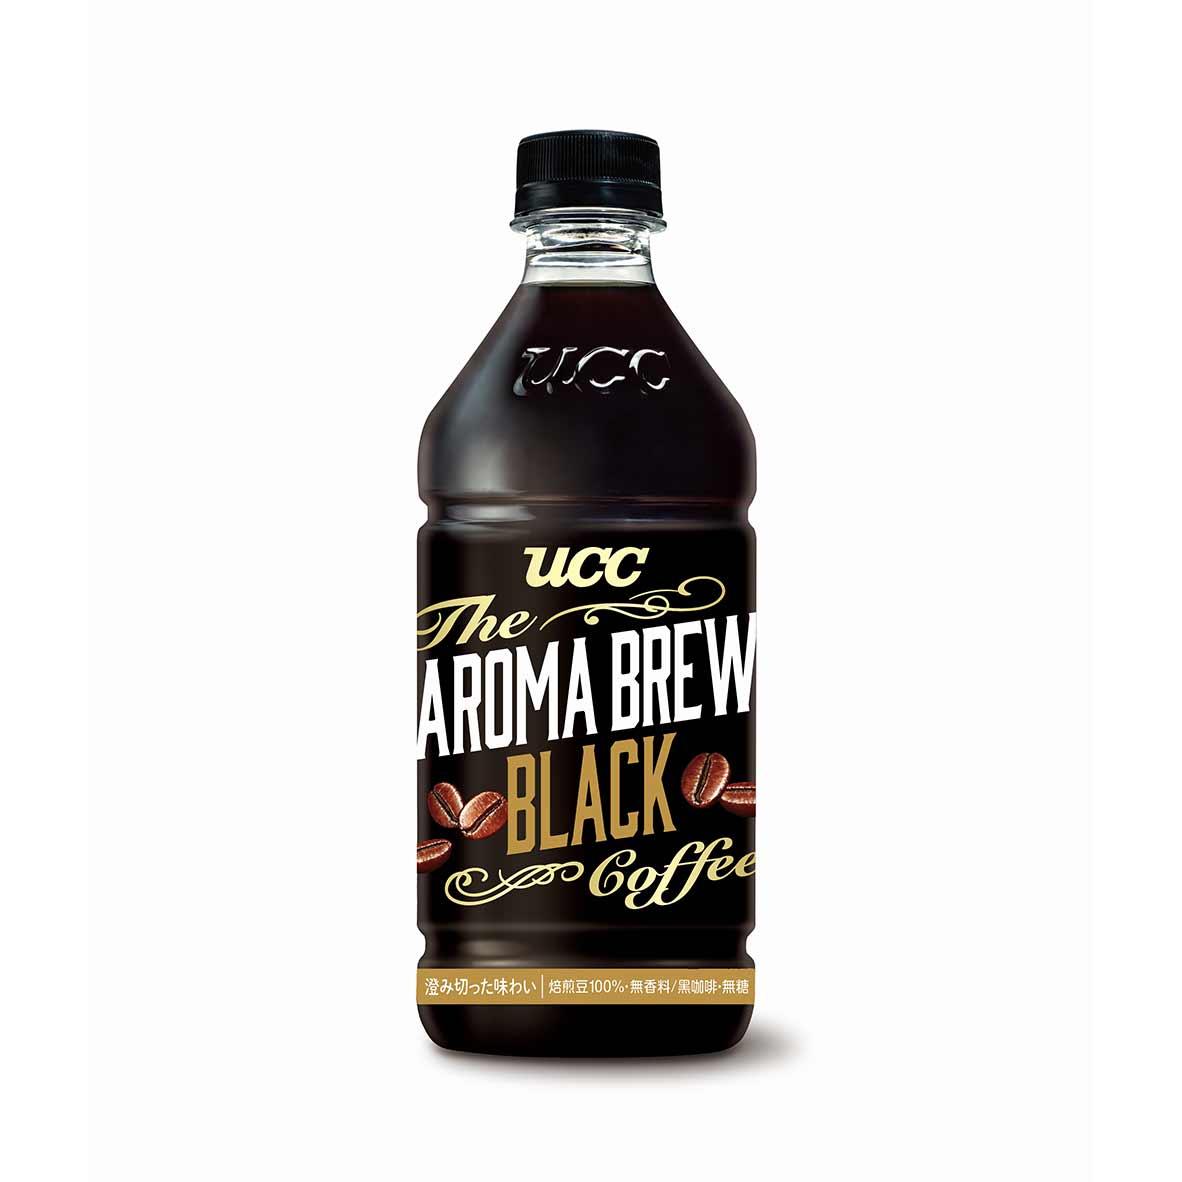 UCC AROMA BREW 艾洛瑪⿊咖啡